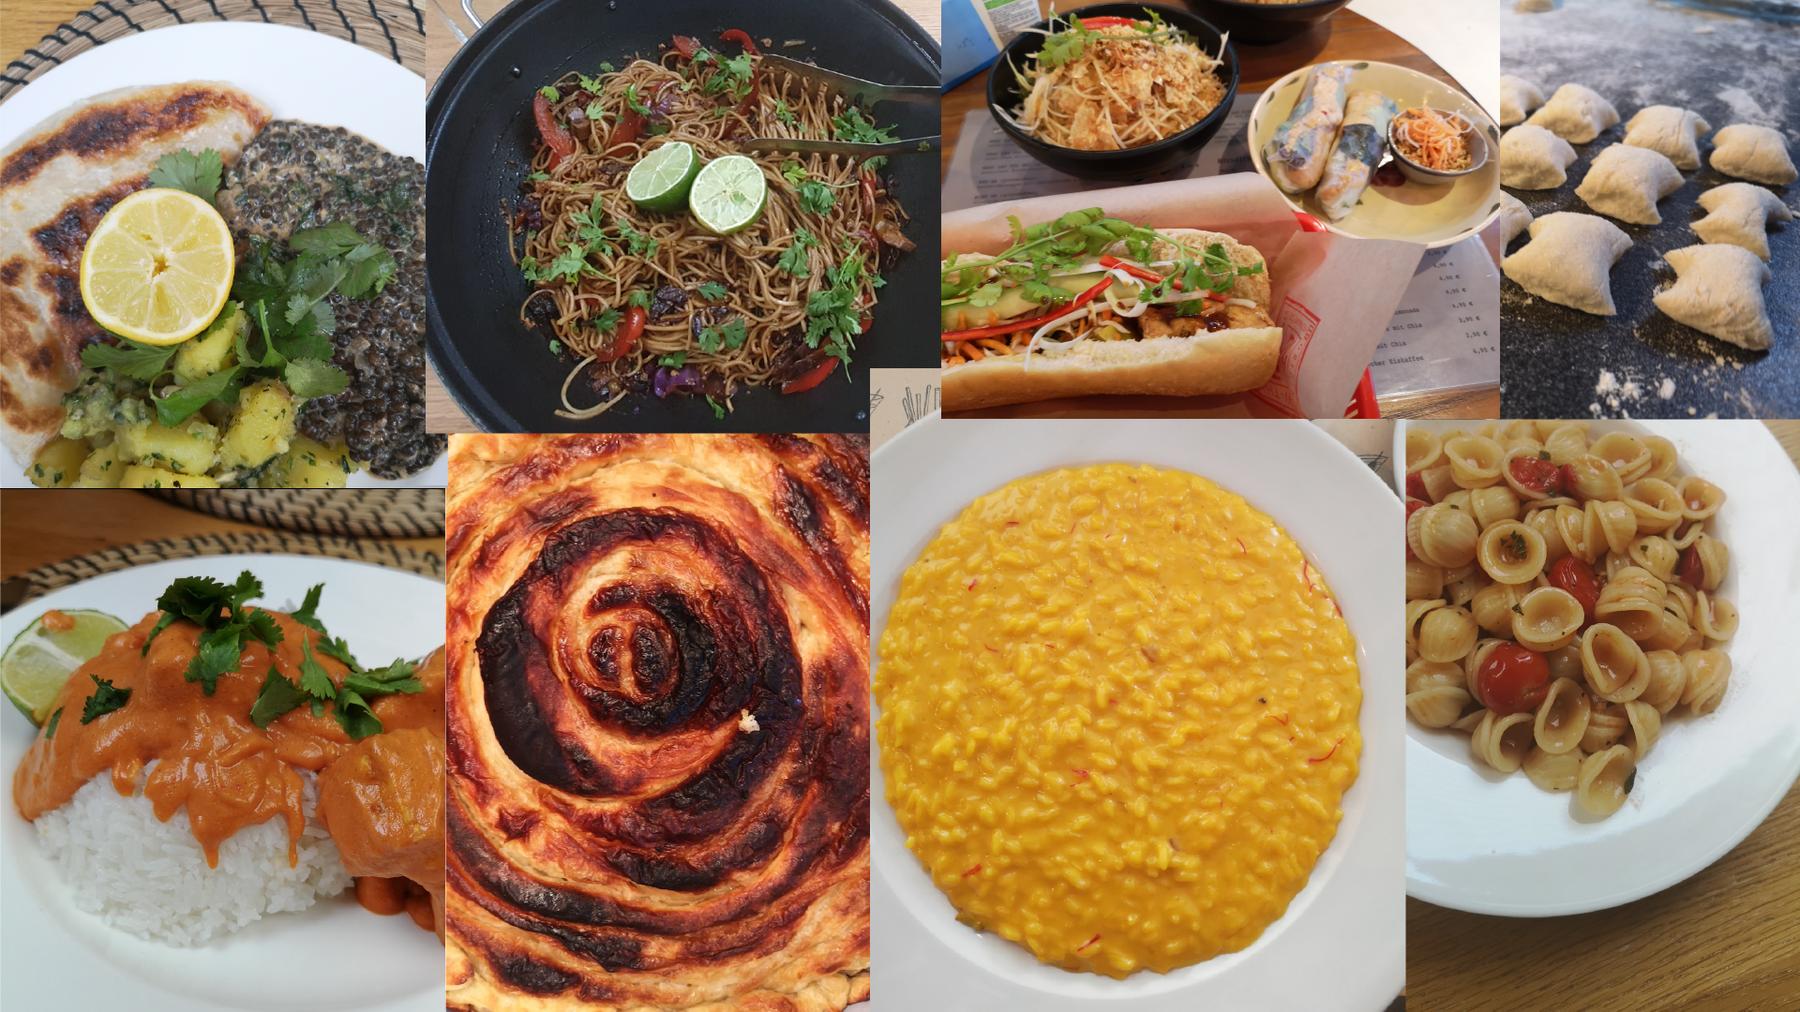 Eine Woche ohne Dal Makhani, Risotto alla Milanese oder Tofu Banh Mi